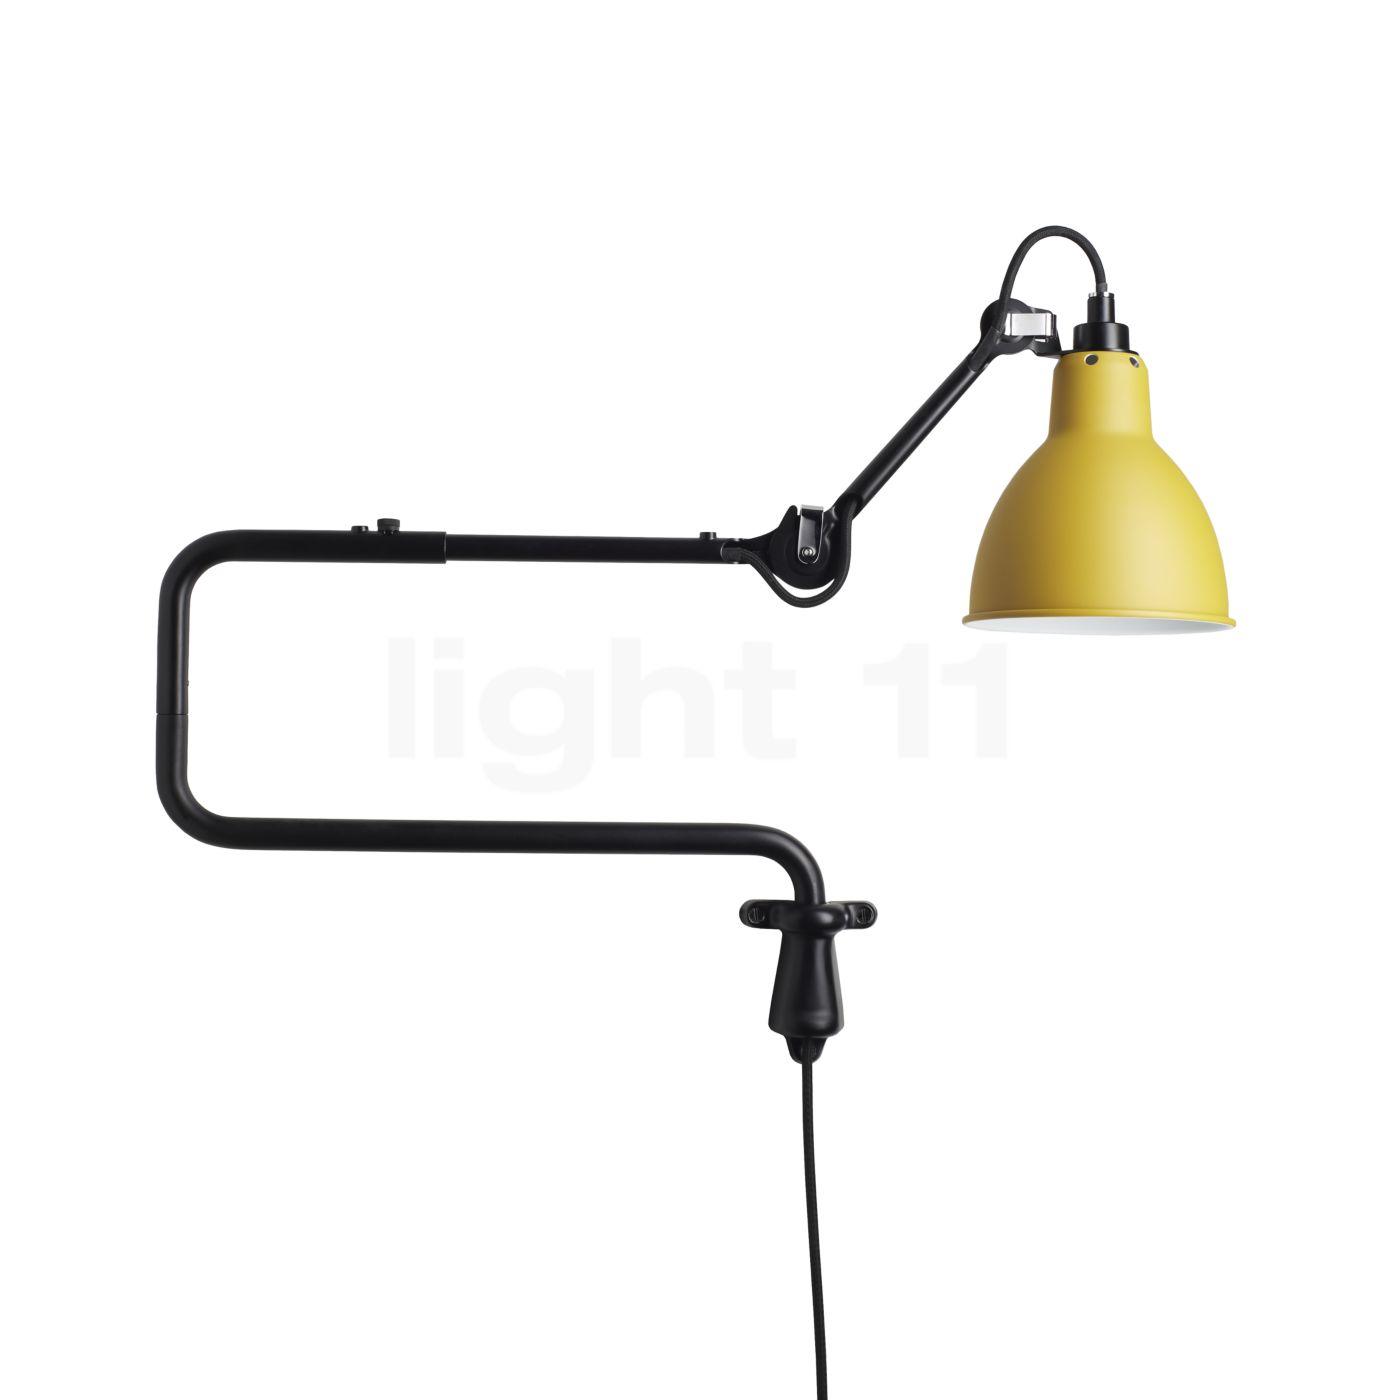 Buy DCW Lampe Gras No 303 Wall light at light11.eu